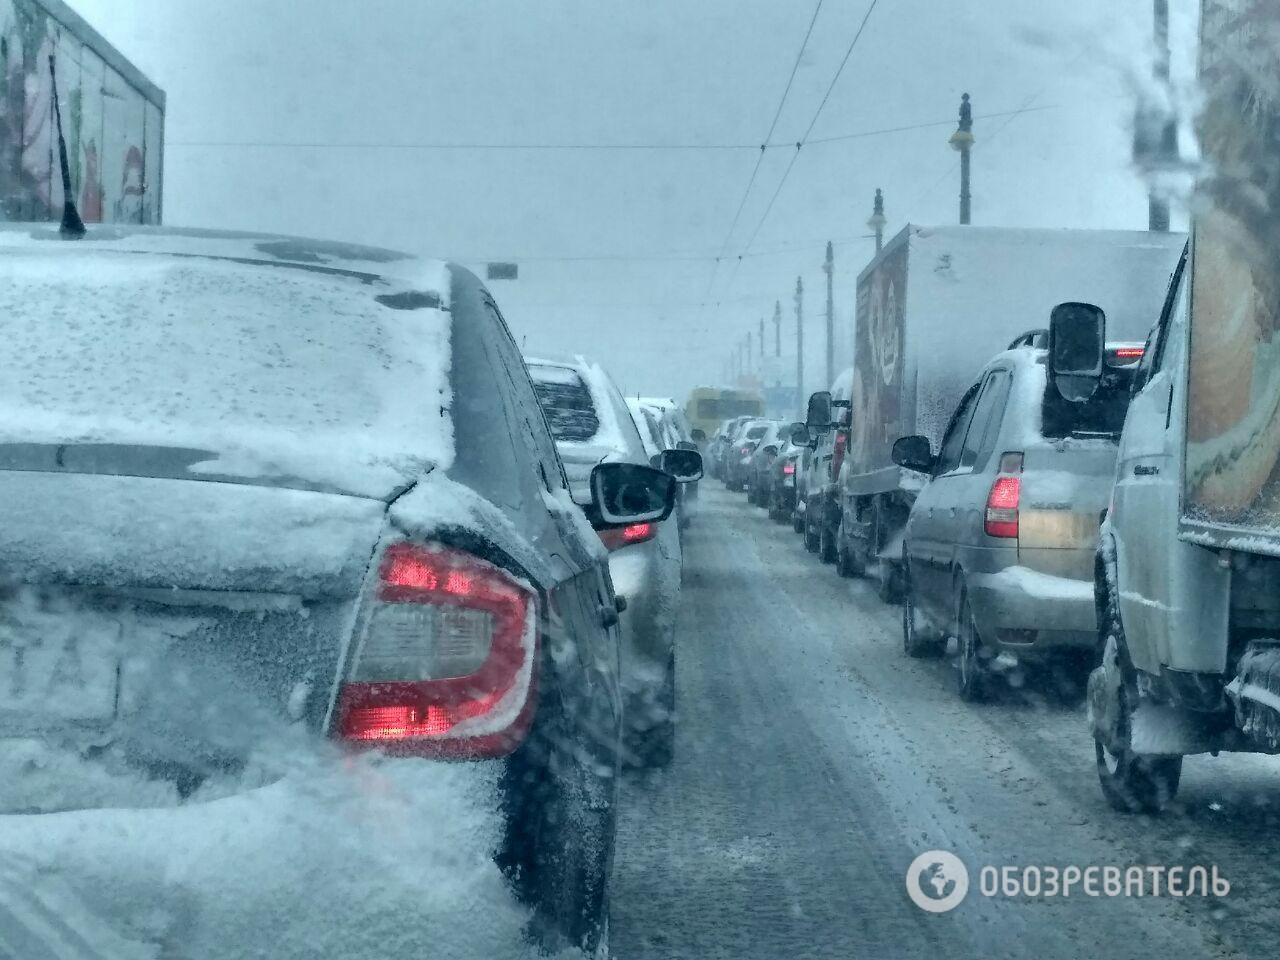 Снегопад парализовал дороги. Пробки вКиеве инавъездах вгород